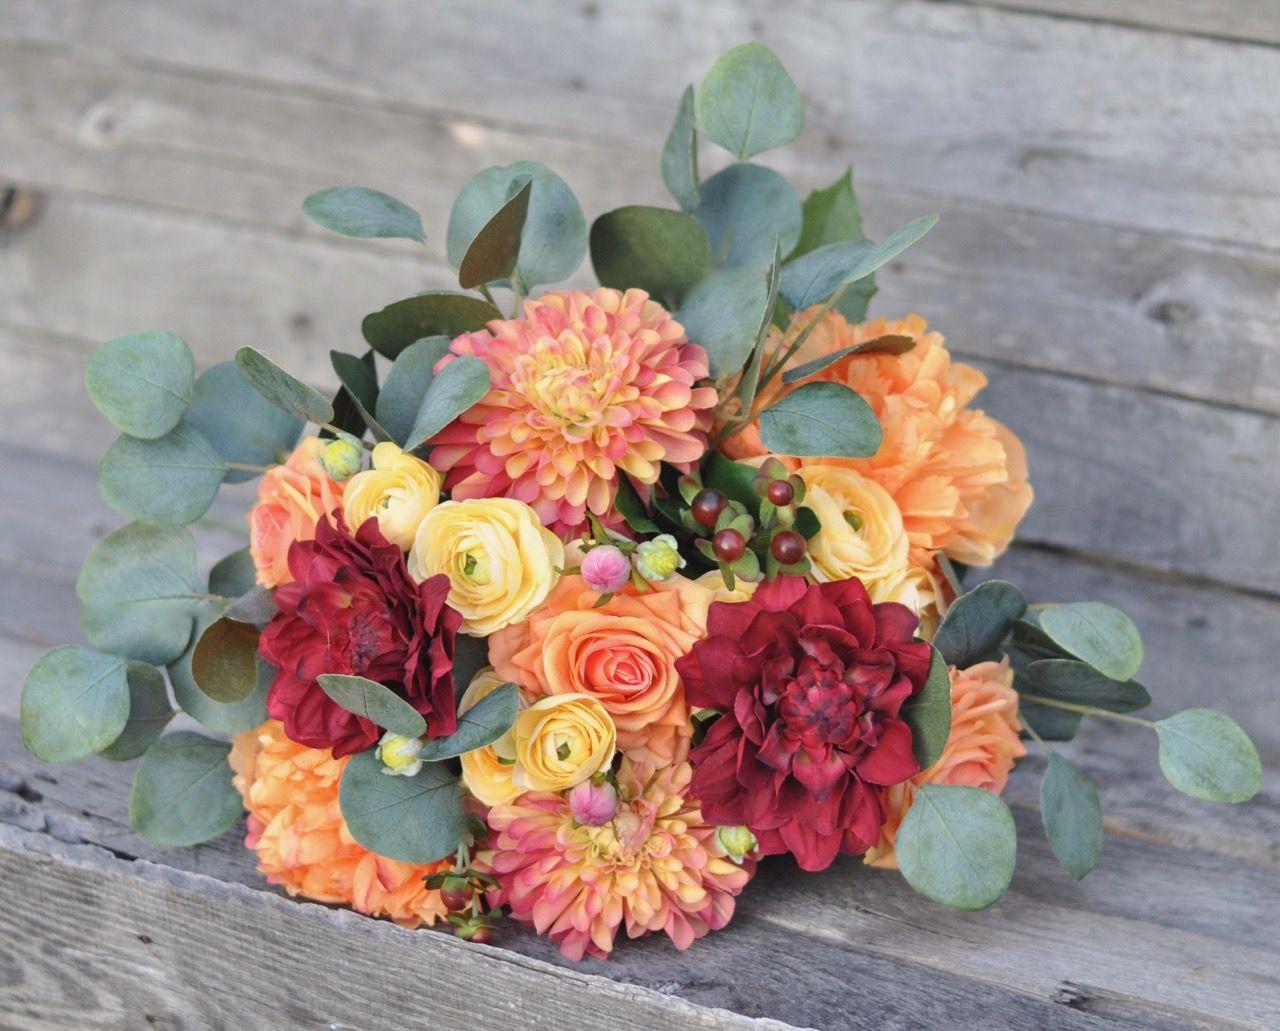 Silk Wedding Bouquets To Last A Lifetime By Hollys Wedding Flowers